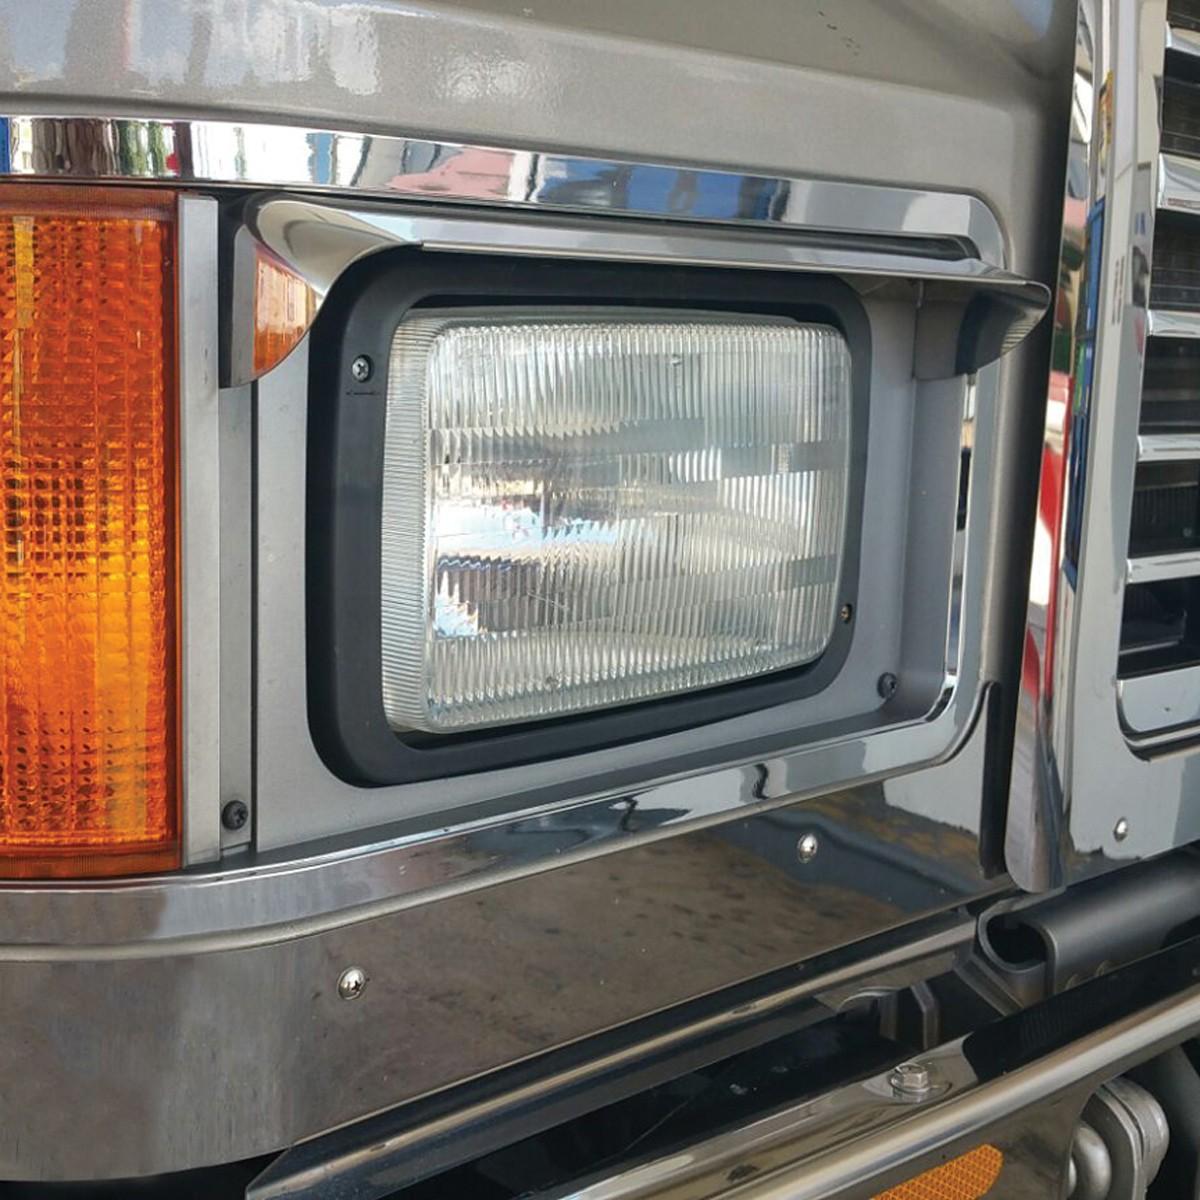 MACK CH Single Headlight Visor - Headlight Visors - Exterior Trims - CH - Mack - Browse by truck ...